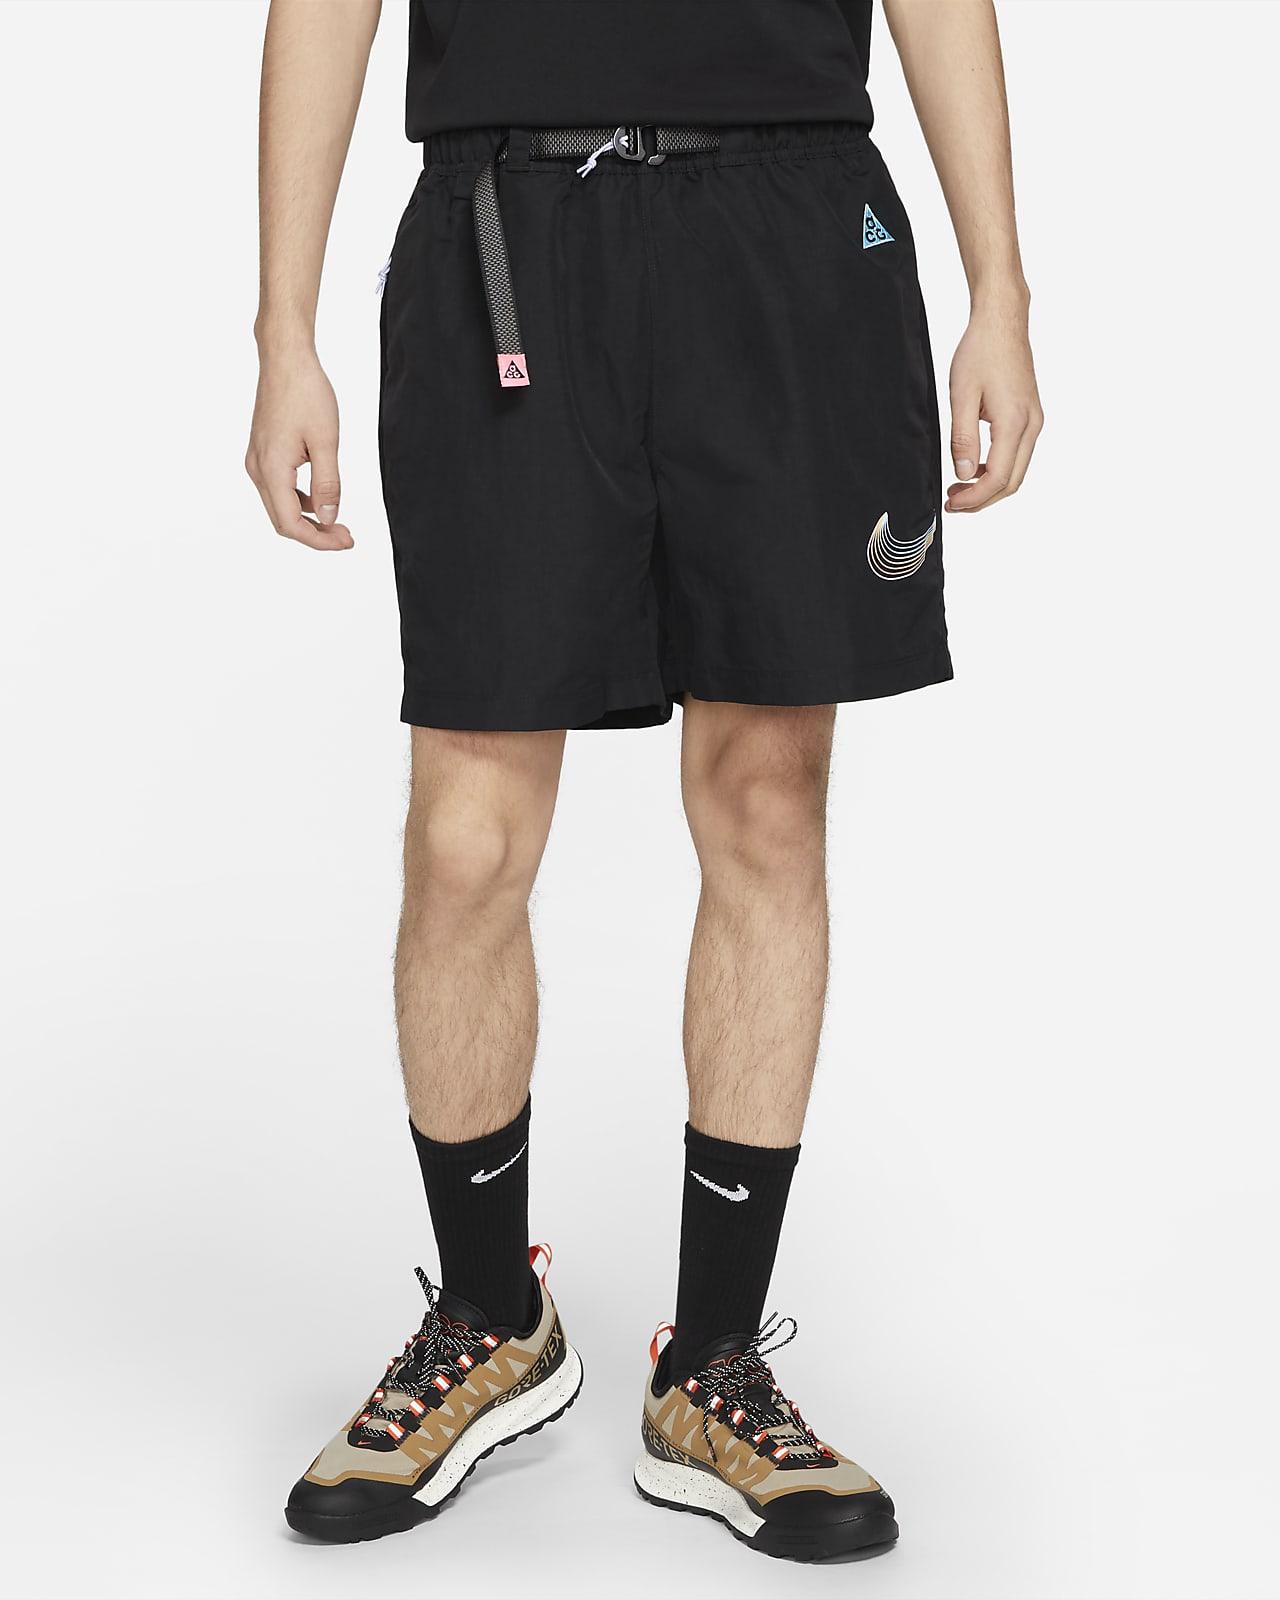 Nike ACG BeTrue Trail Shorts